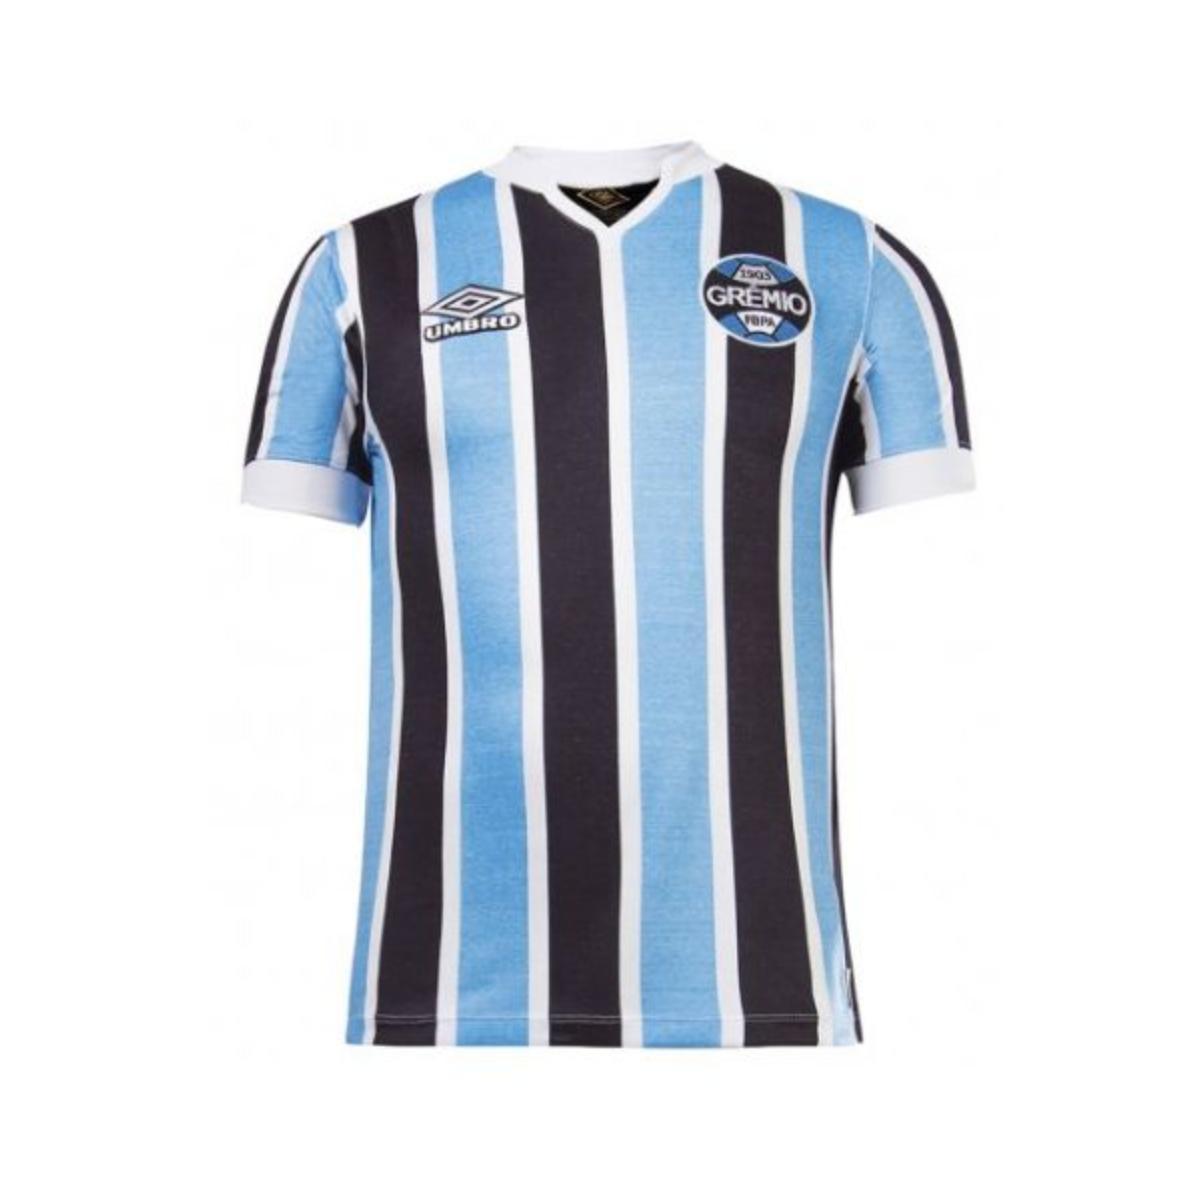 Camisa Masculina Grêmio U31g514219.312 Of.1  Retrô 1981 Azul/preto/branco